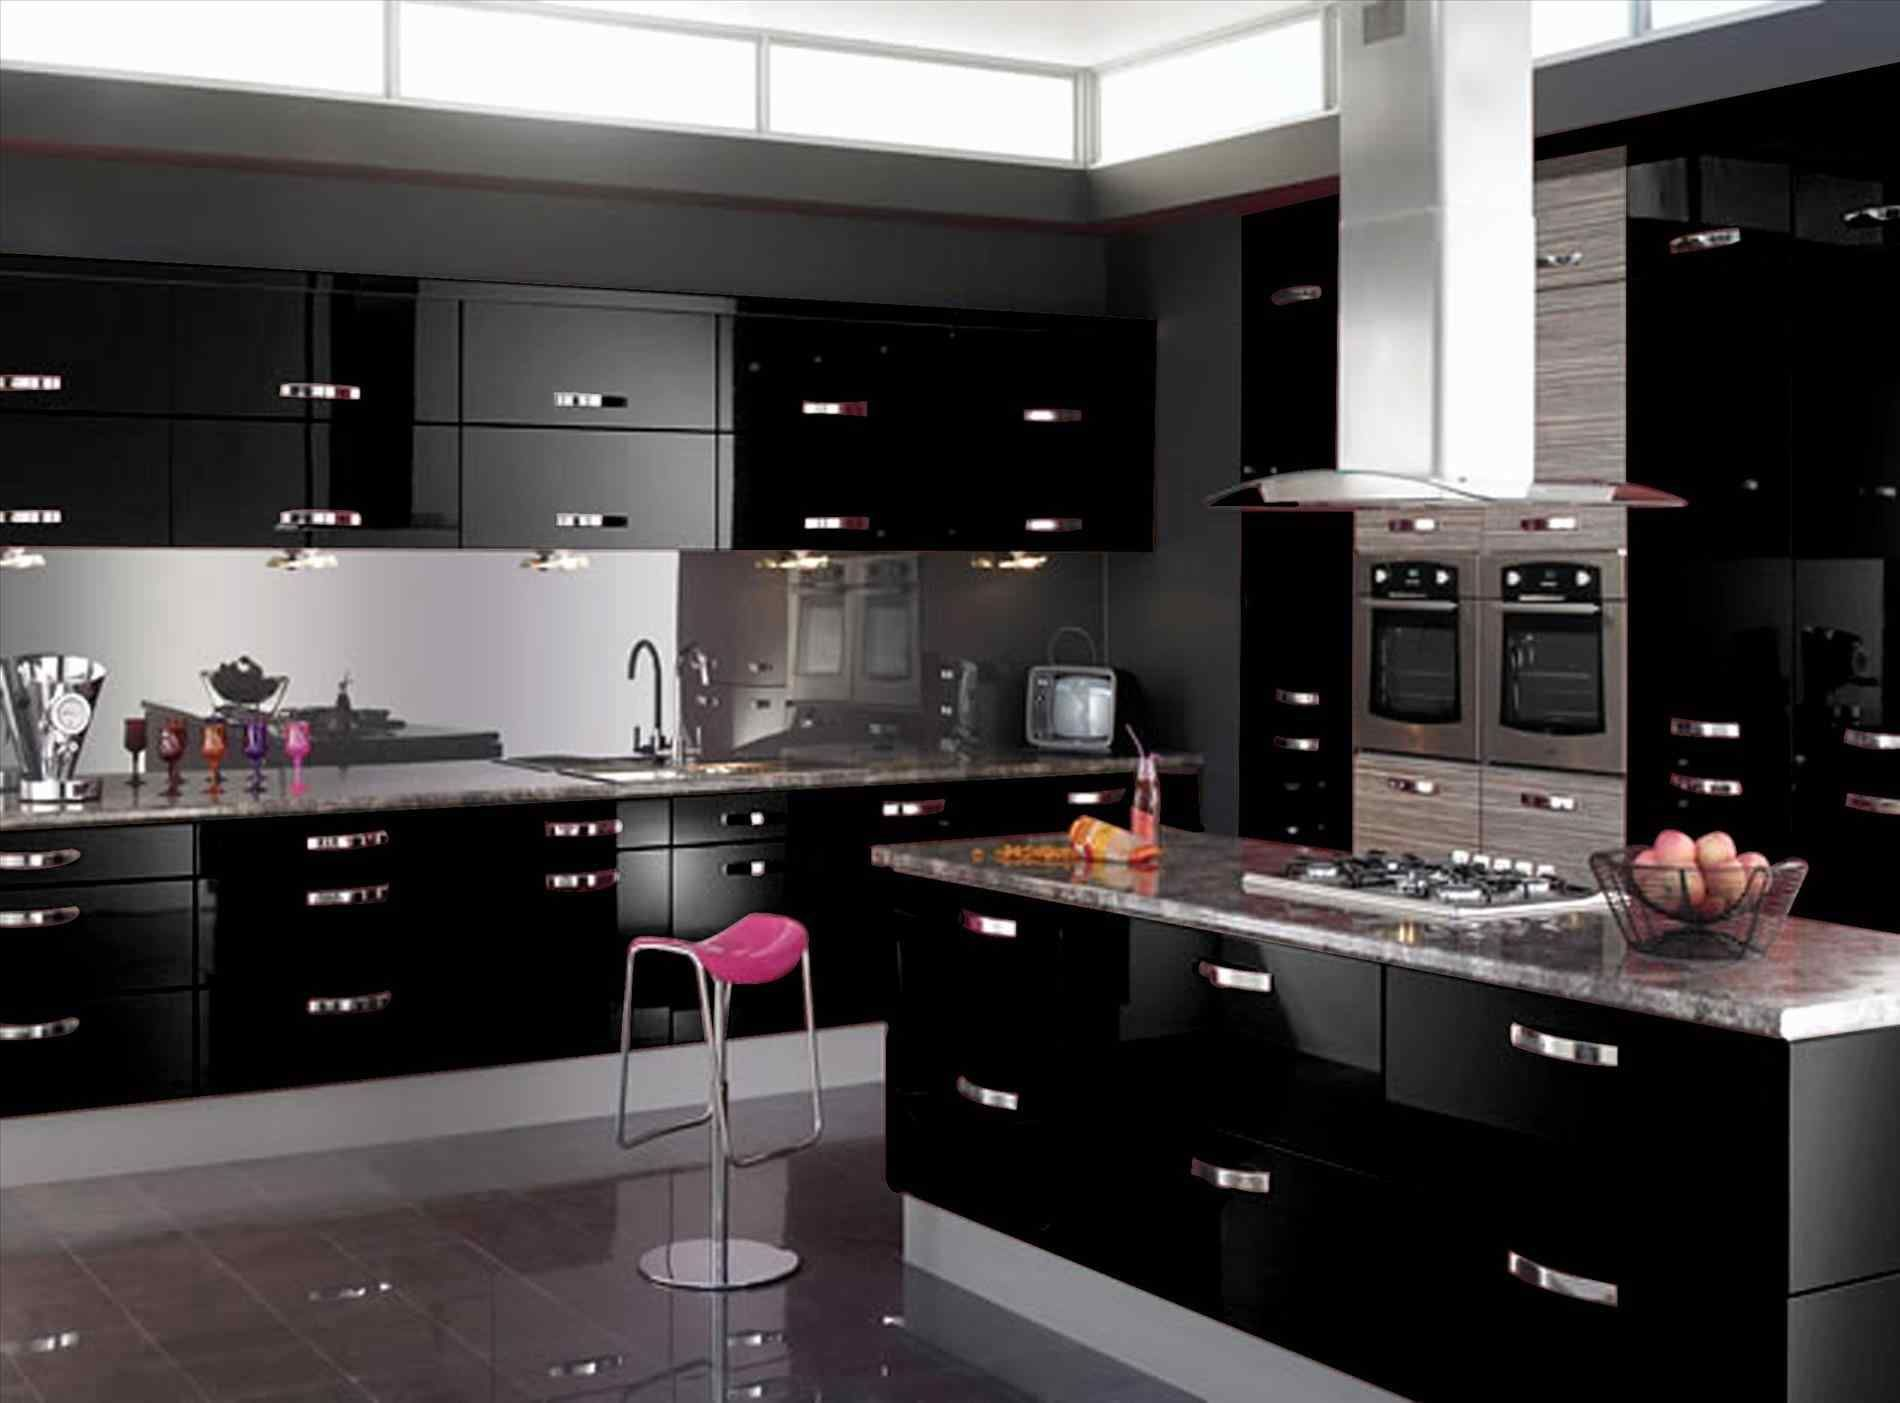 Awesome 13 Black Shiny Kitchen Cabinets Ideas For Stunning Kitchen Breakpr Cozinhas Cozinha